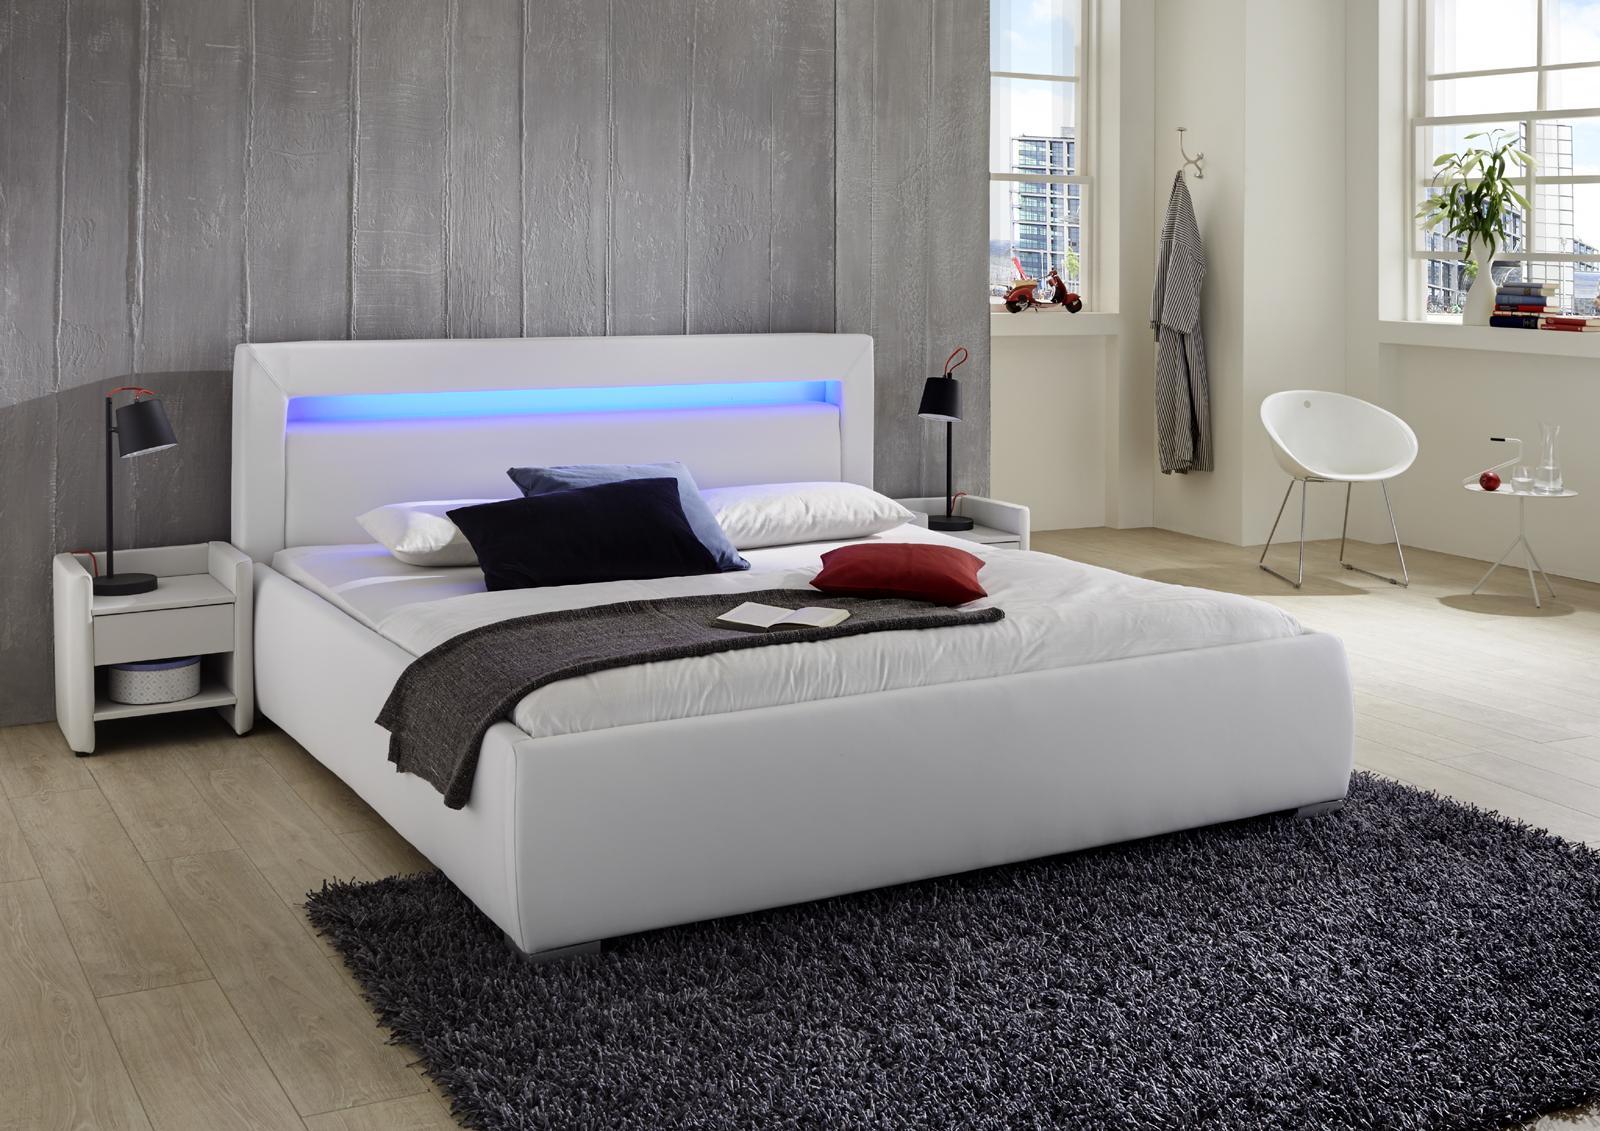 sam polsterbett 90 x 200 cm wei lumina g nstig. Black Bedroom Furniture Sets. Home Design Ideas